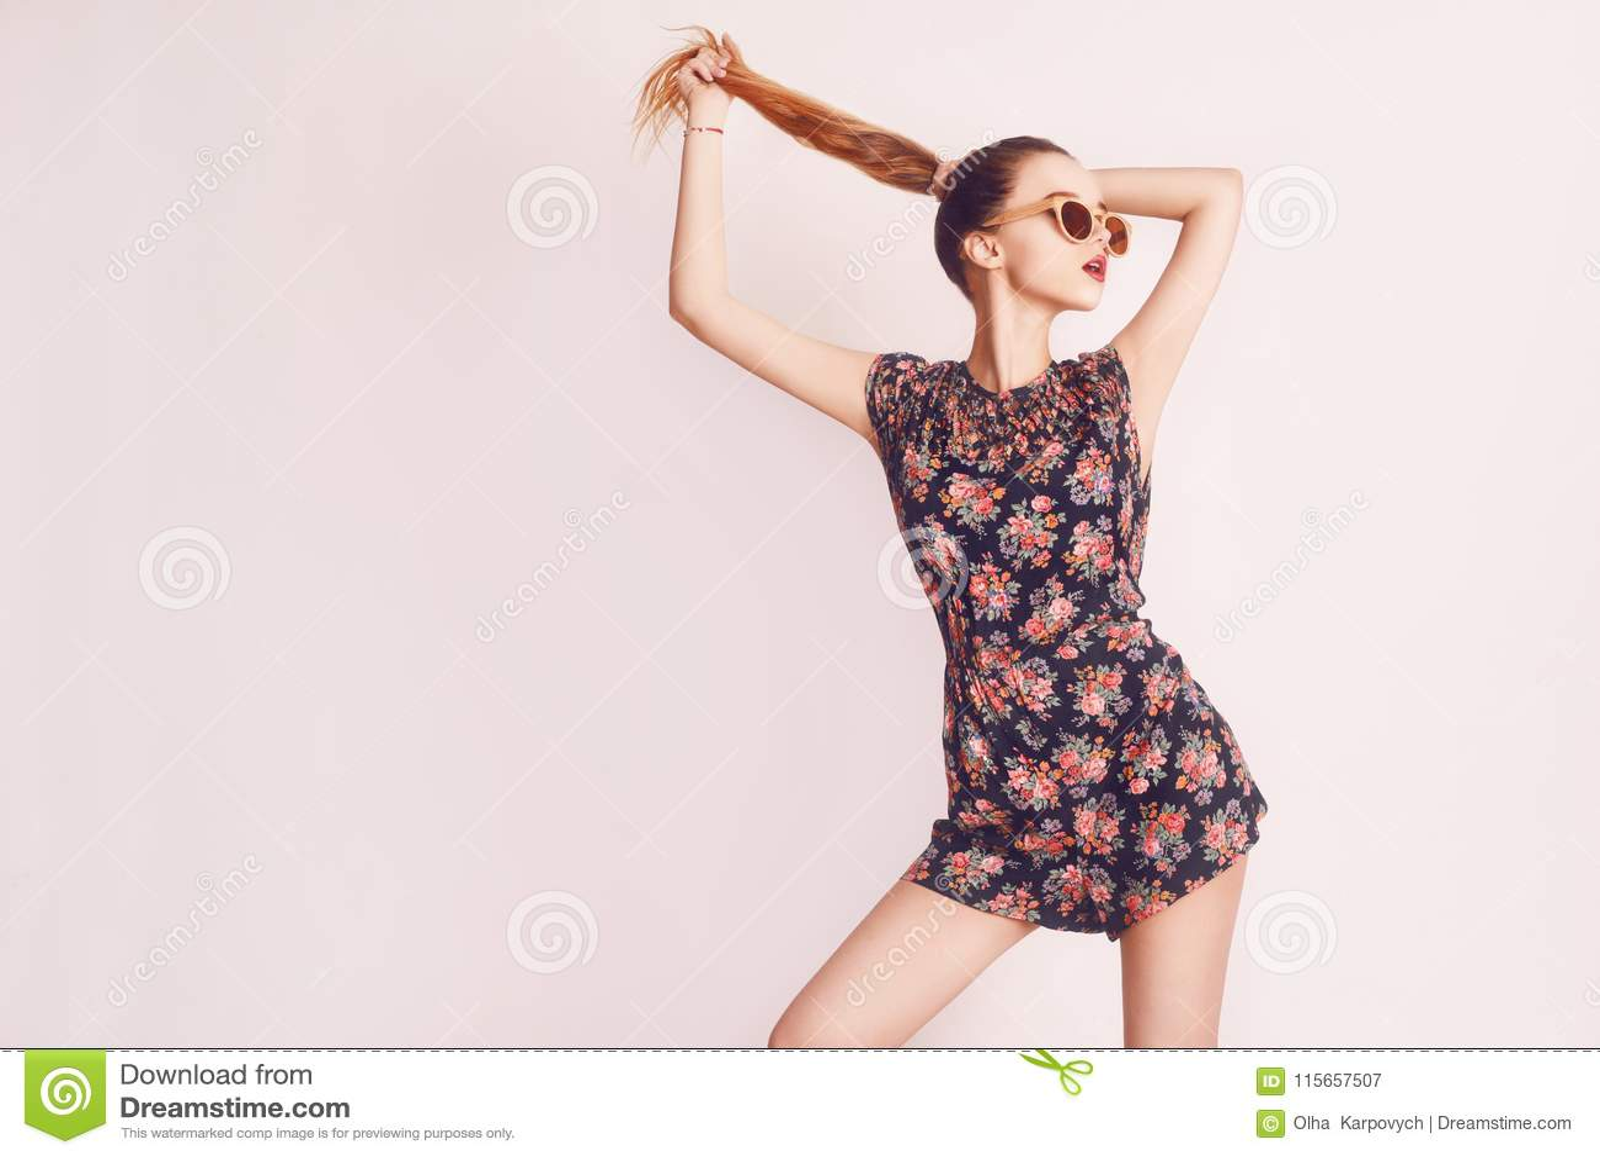 Stylish beauty model girl wearing dark wooden sunglasses and dress. Fashion beautiful woman with long hair wearing sunglasses.